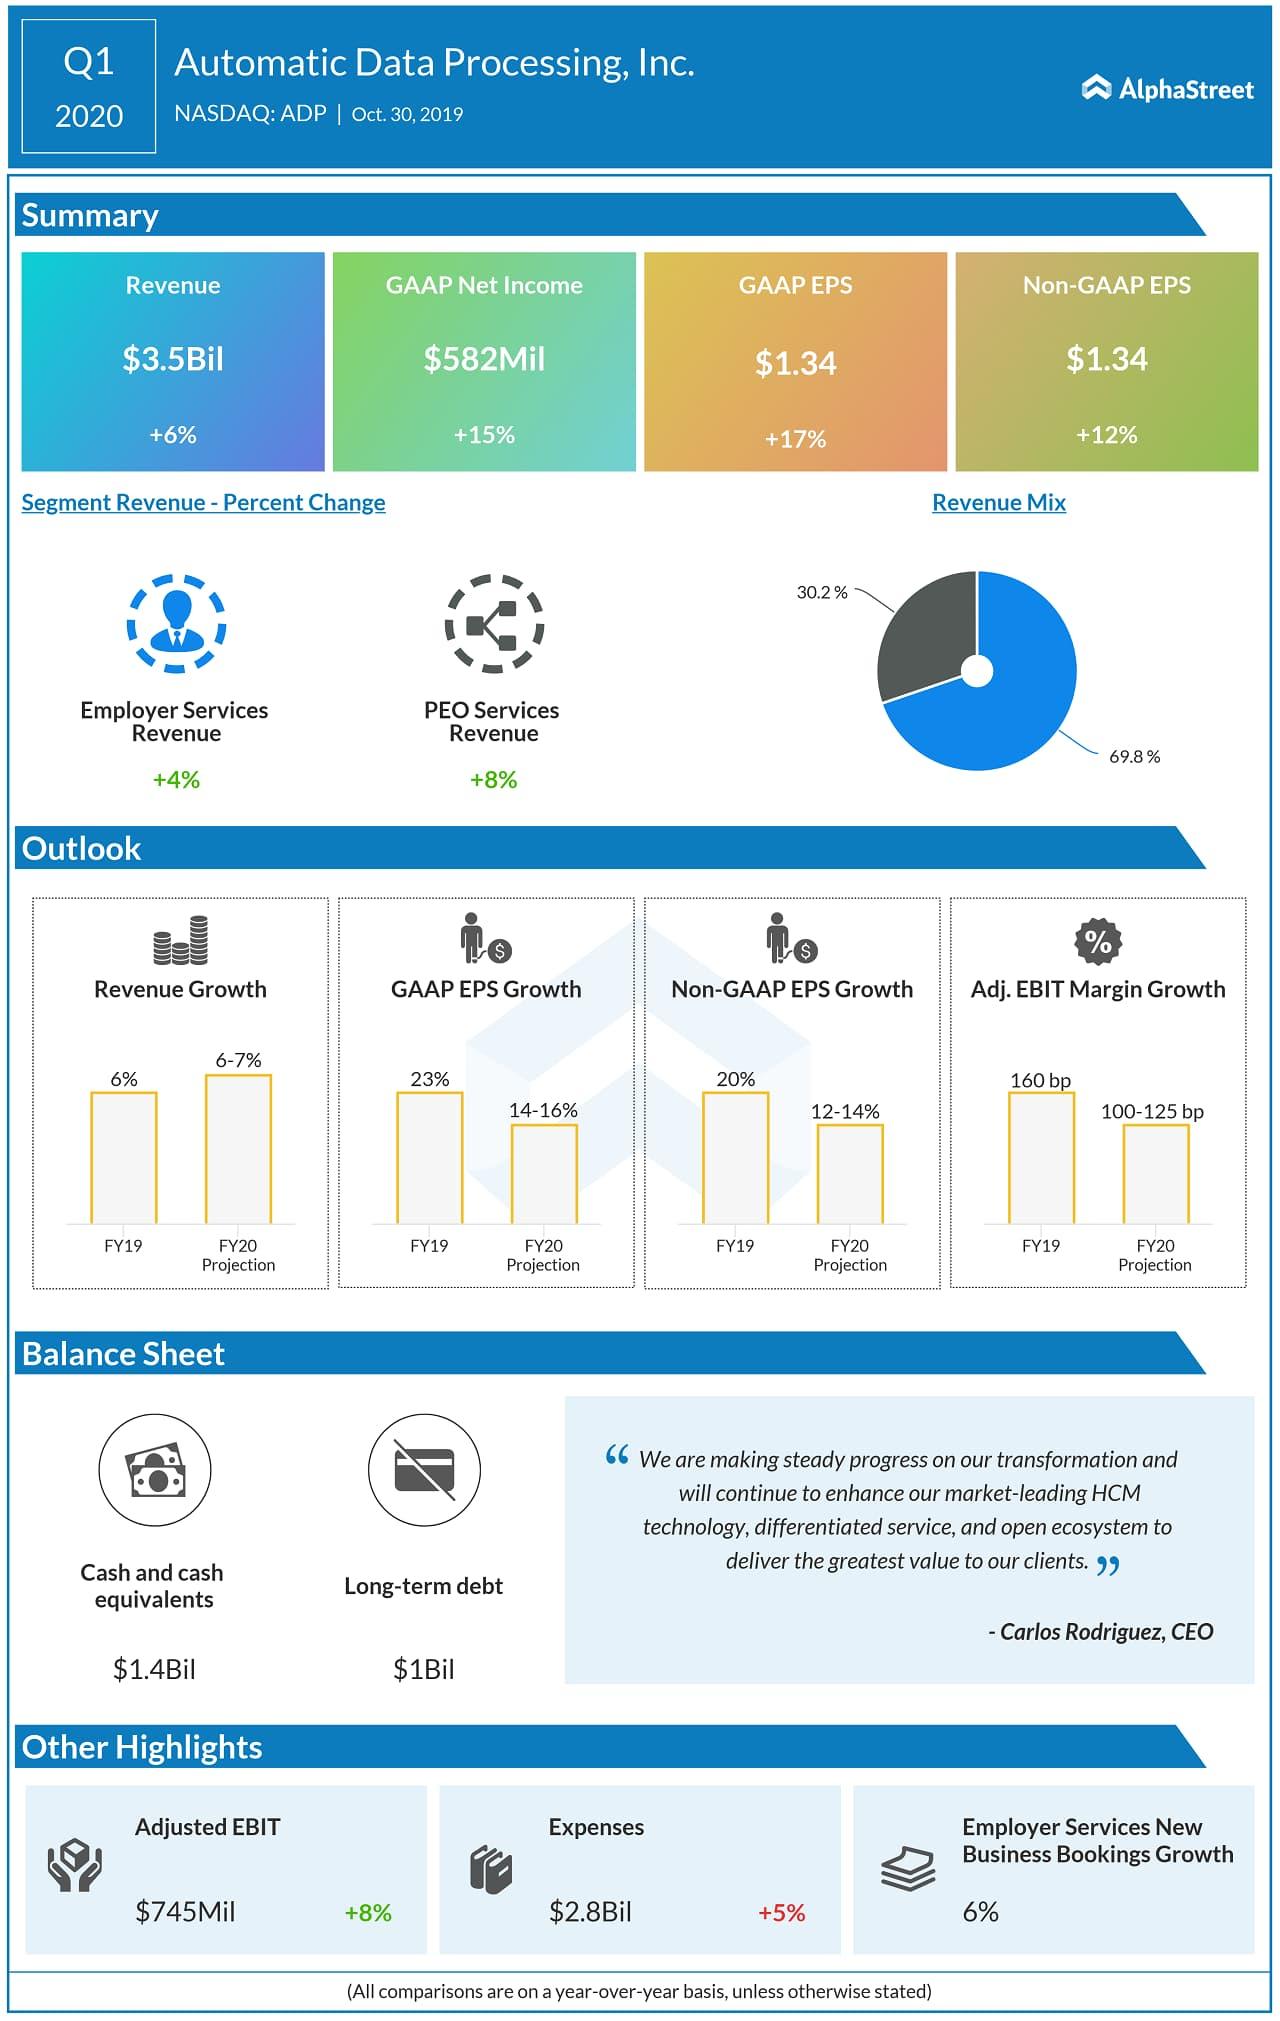 Automatic Data Processing (NASDAQ: ADP): Q1 2020 Earnings Snapshot